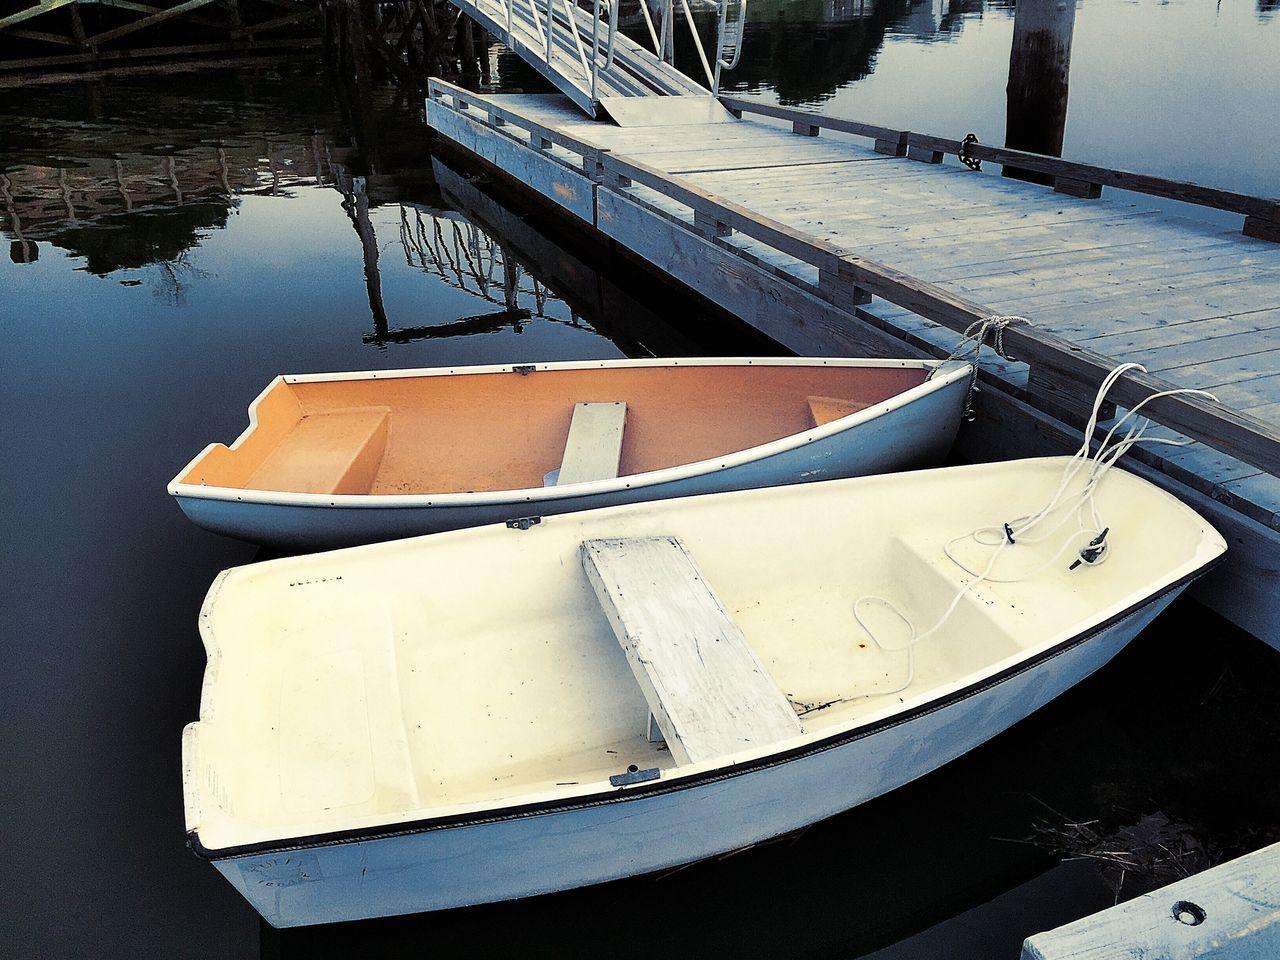 Boats Moored At Pier